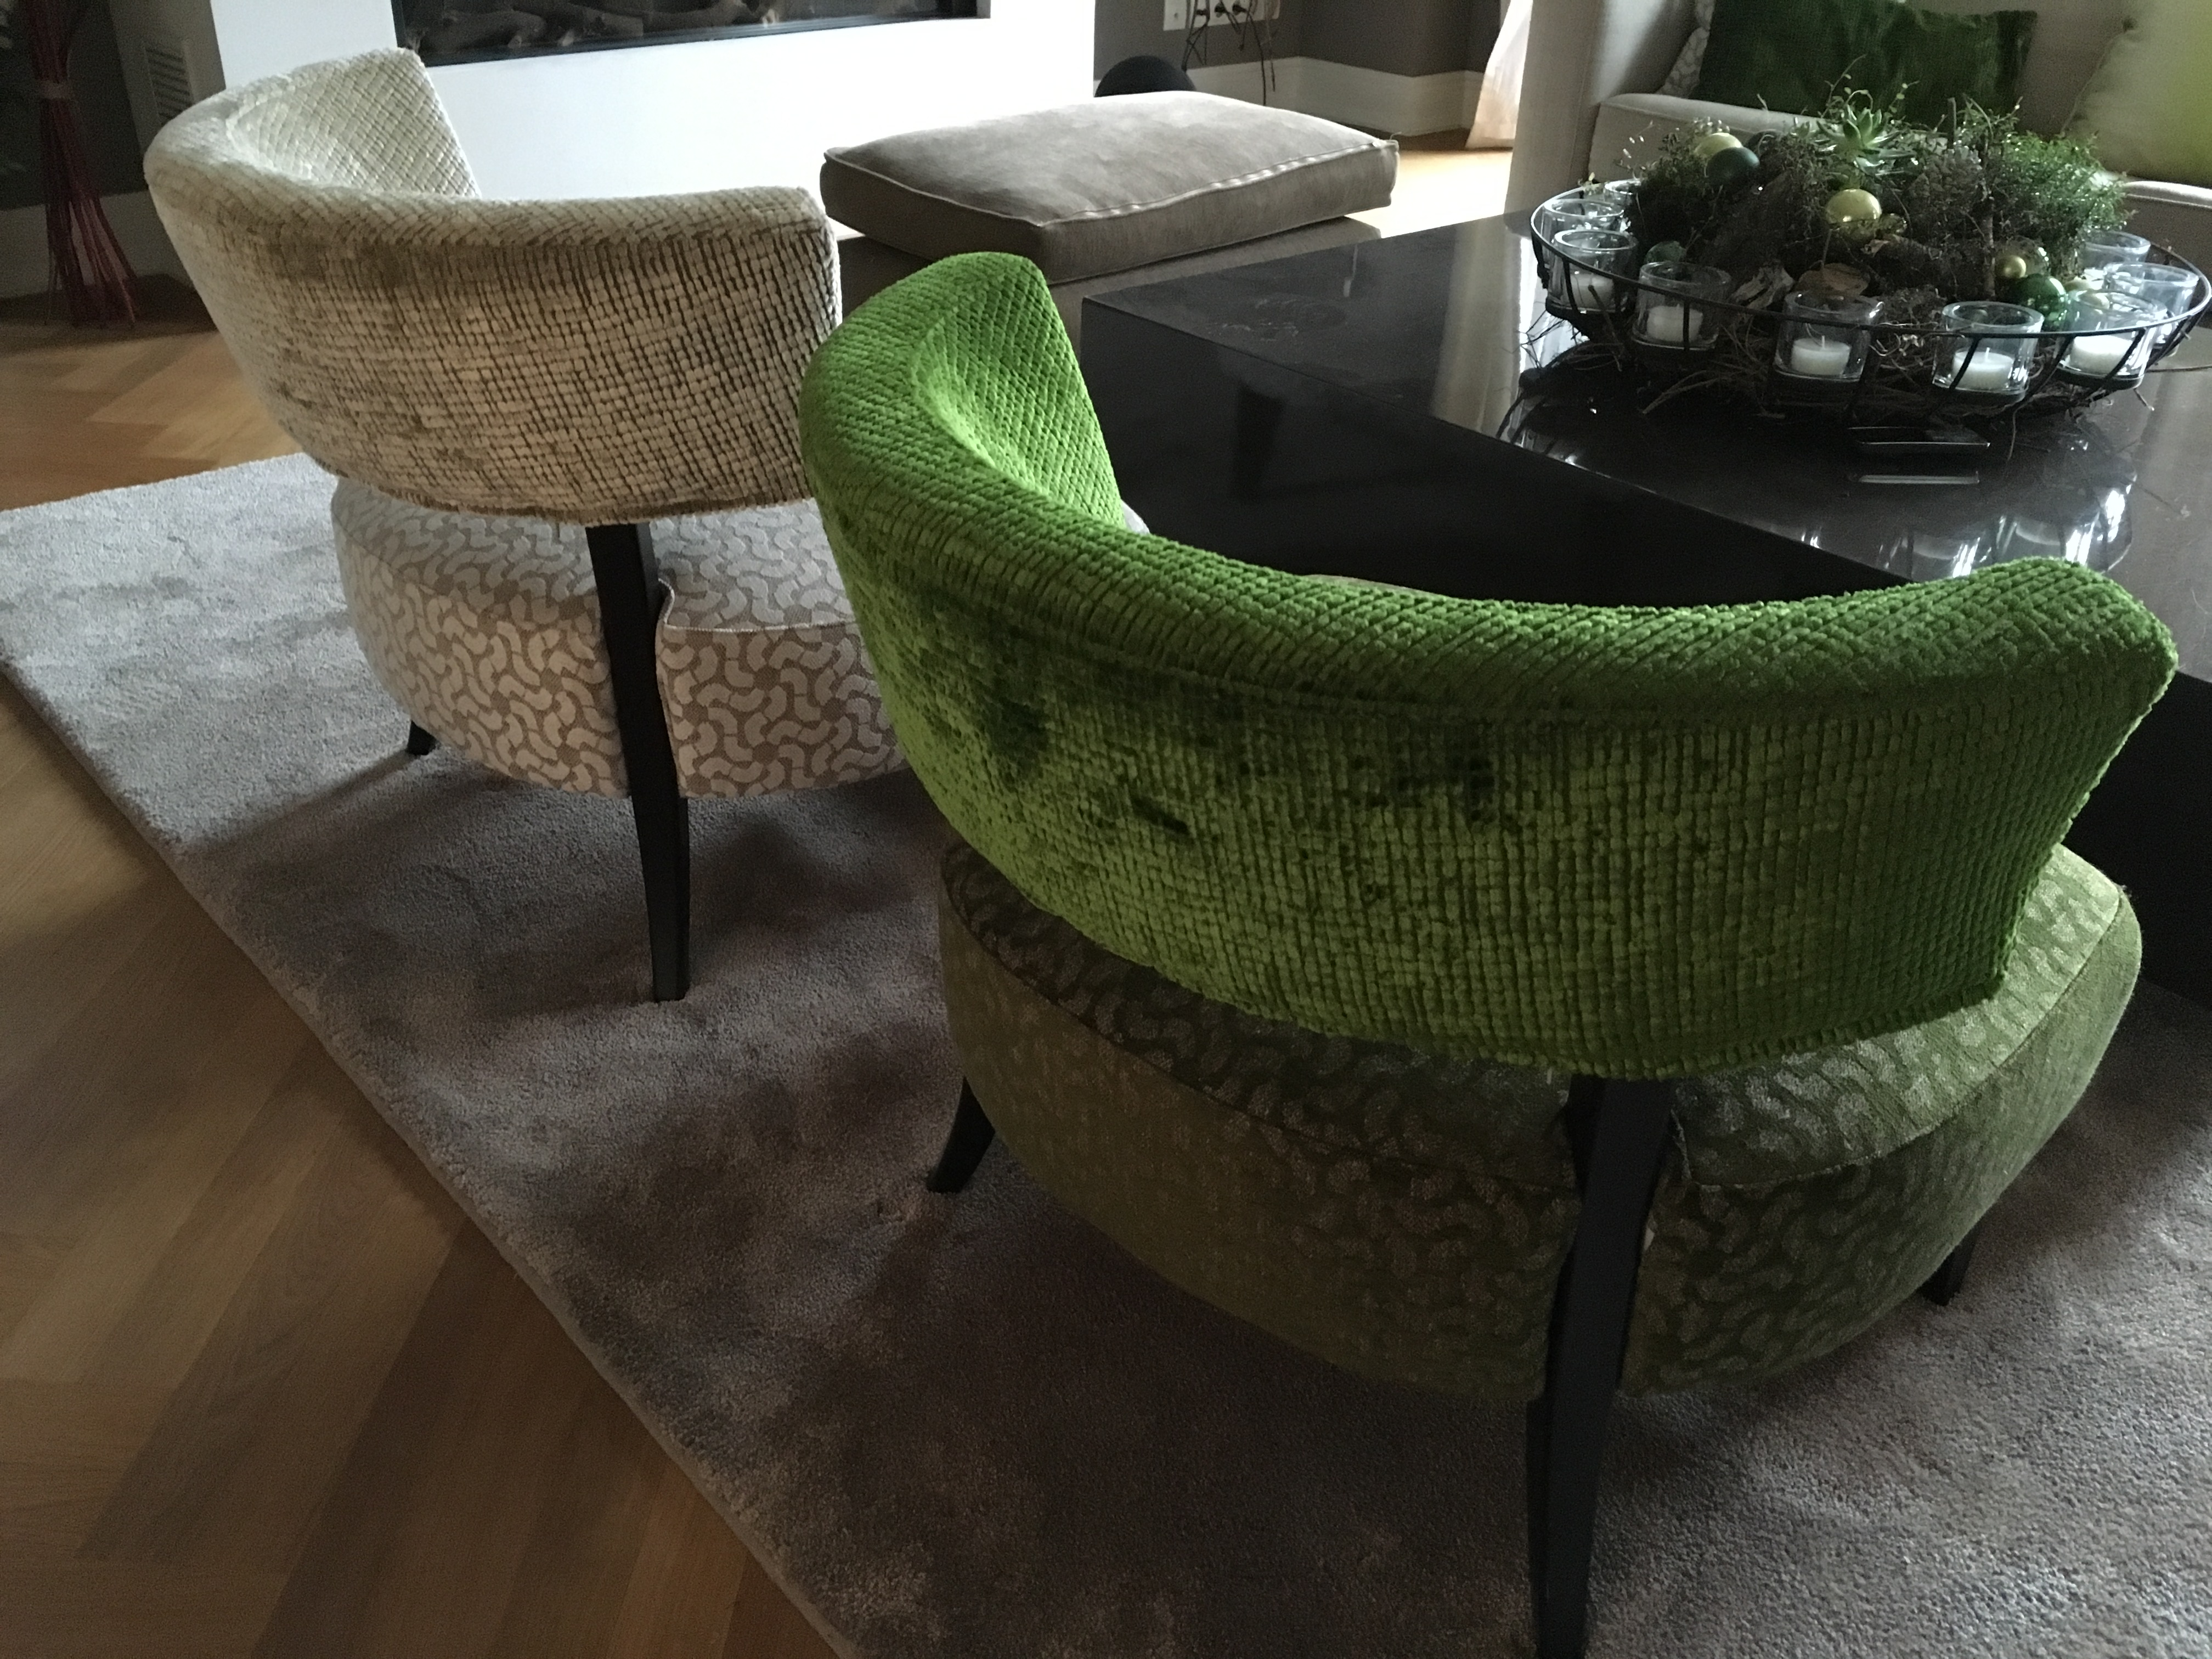 Designersessel & Möbelkonzepte